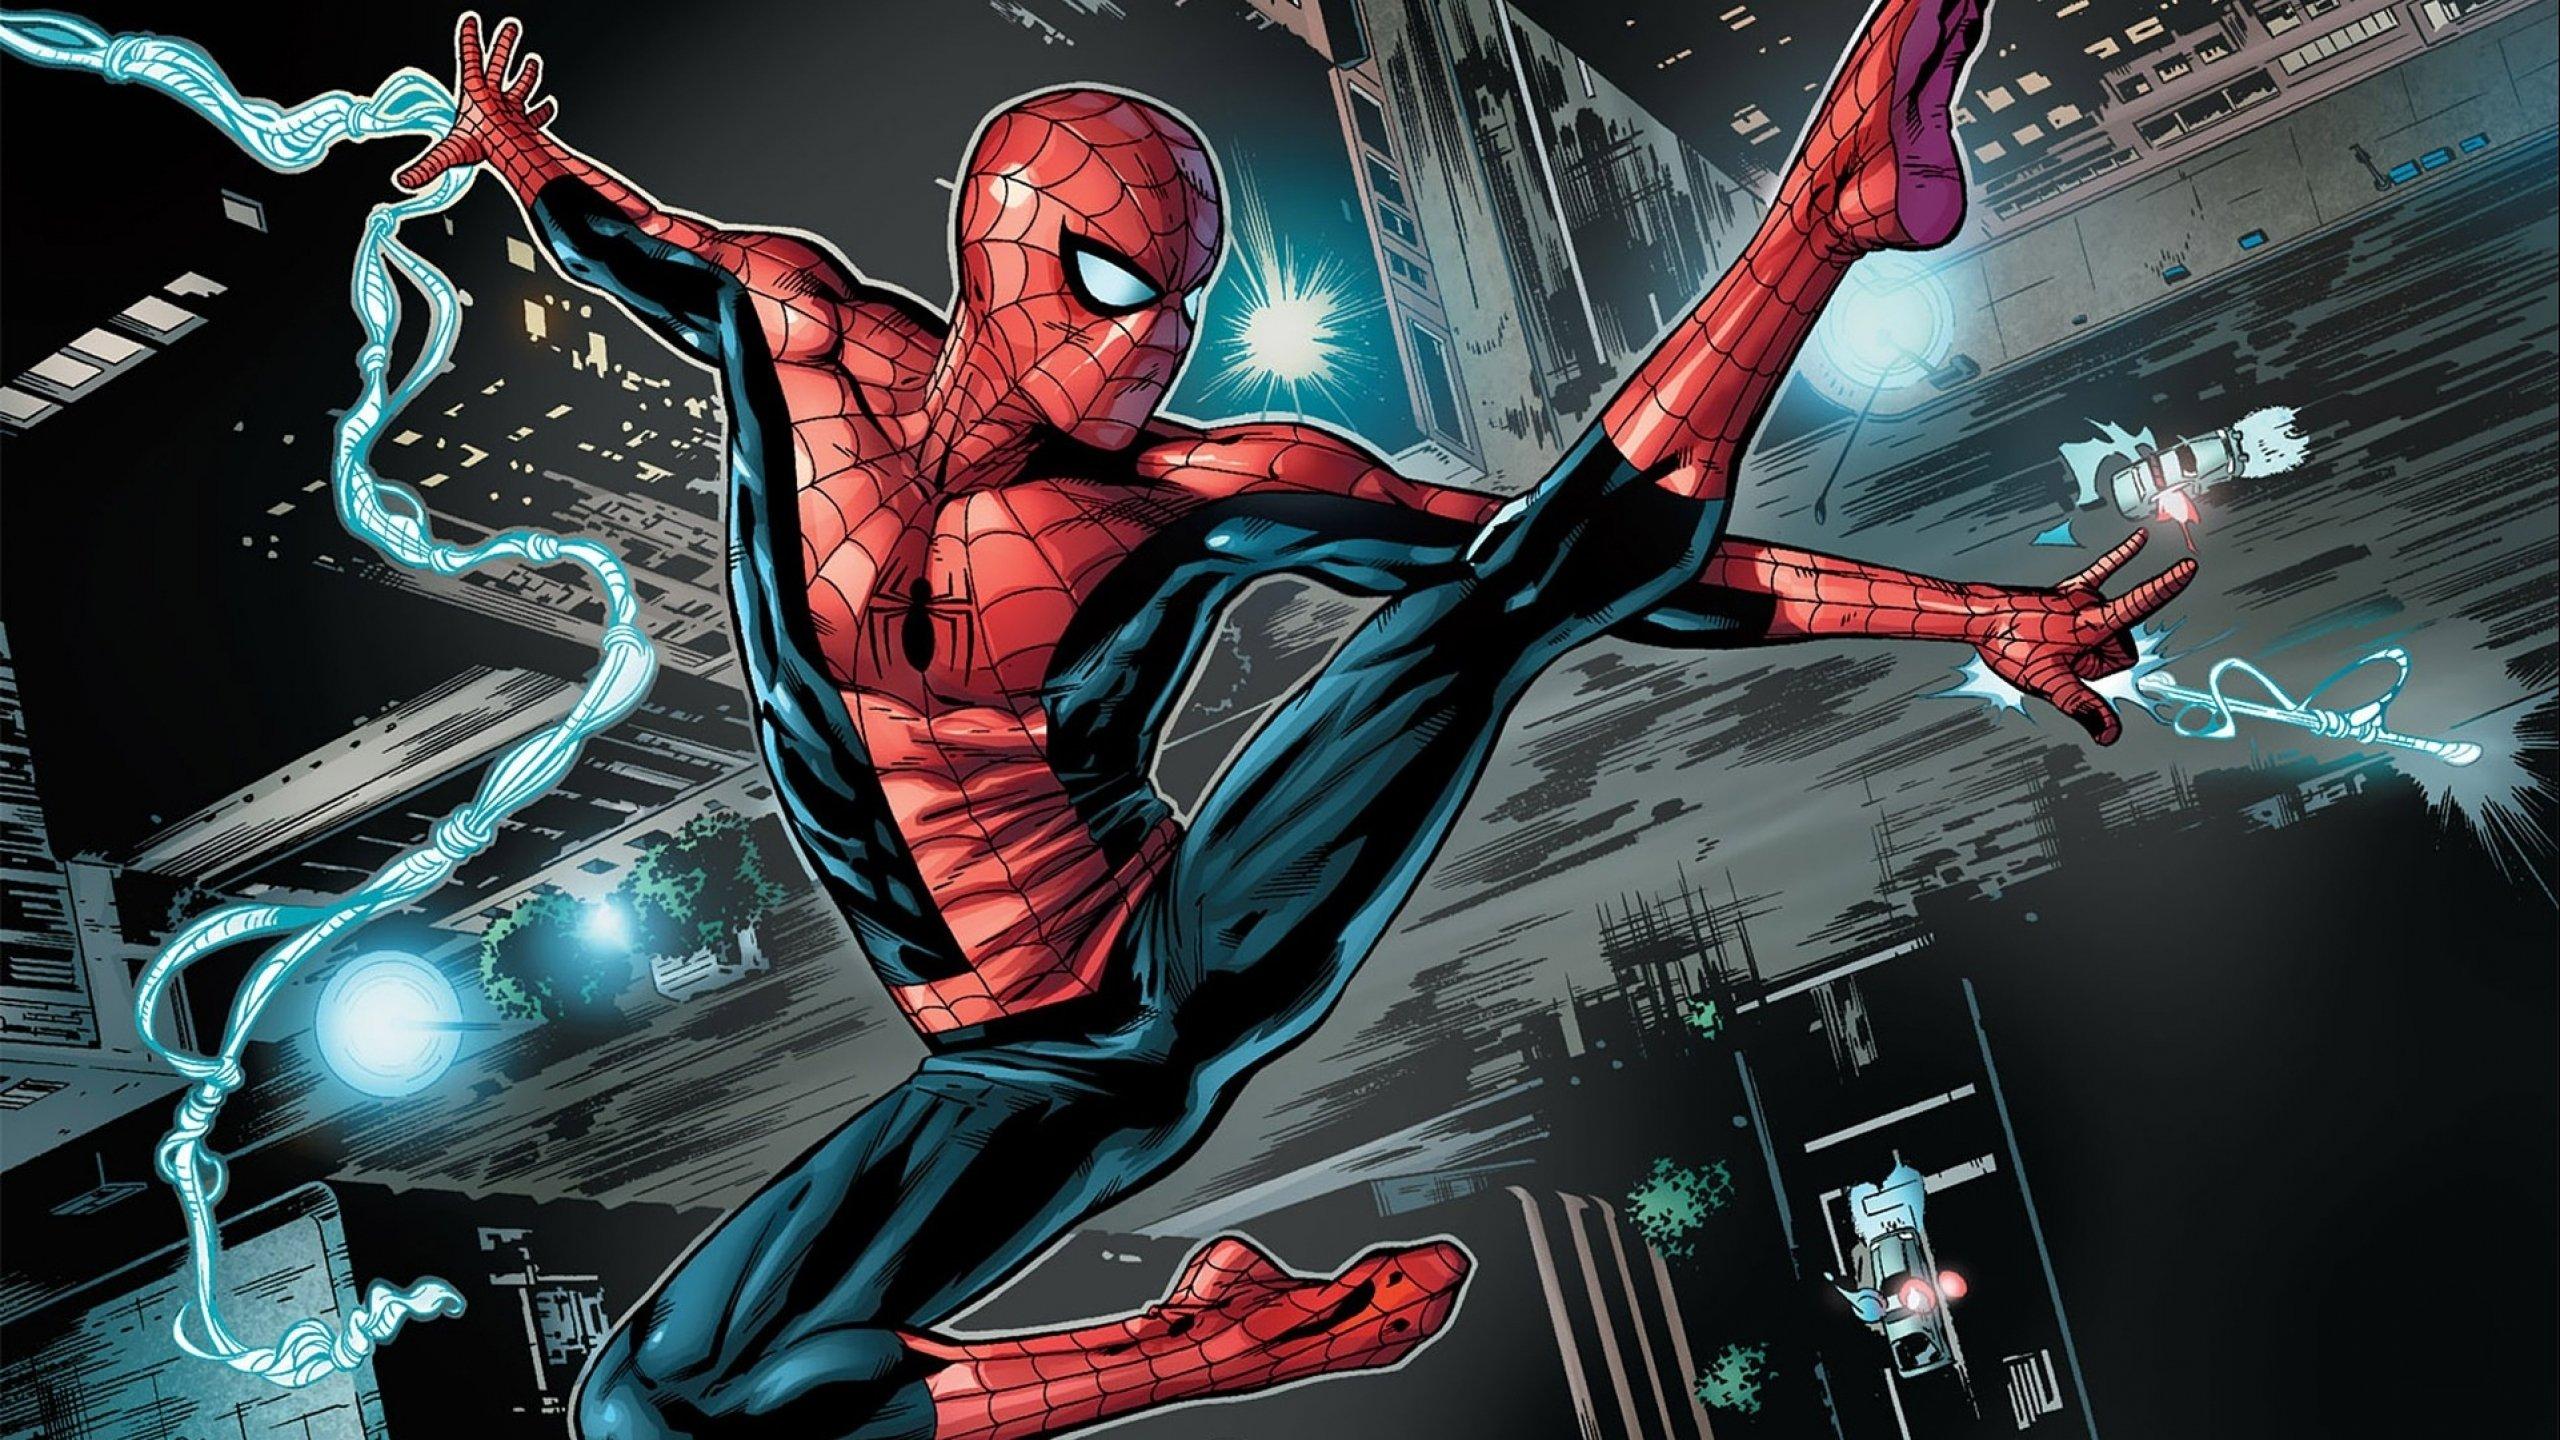 Wallpaper 2560x1440 Px Action Man Marvel Spider Spiderman